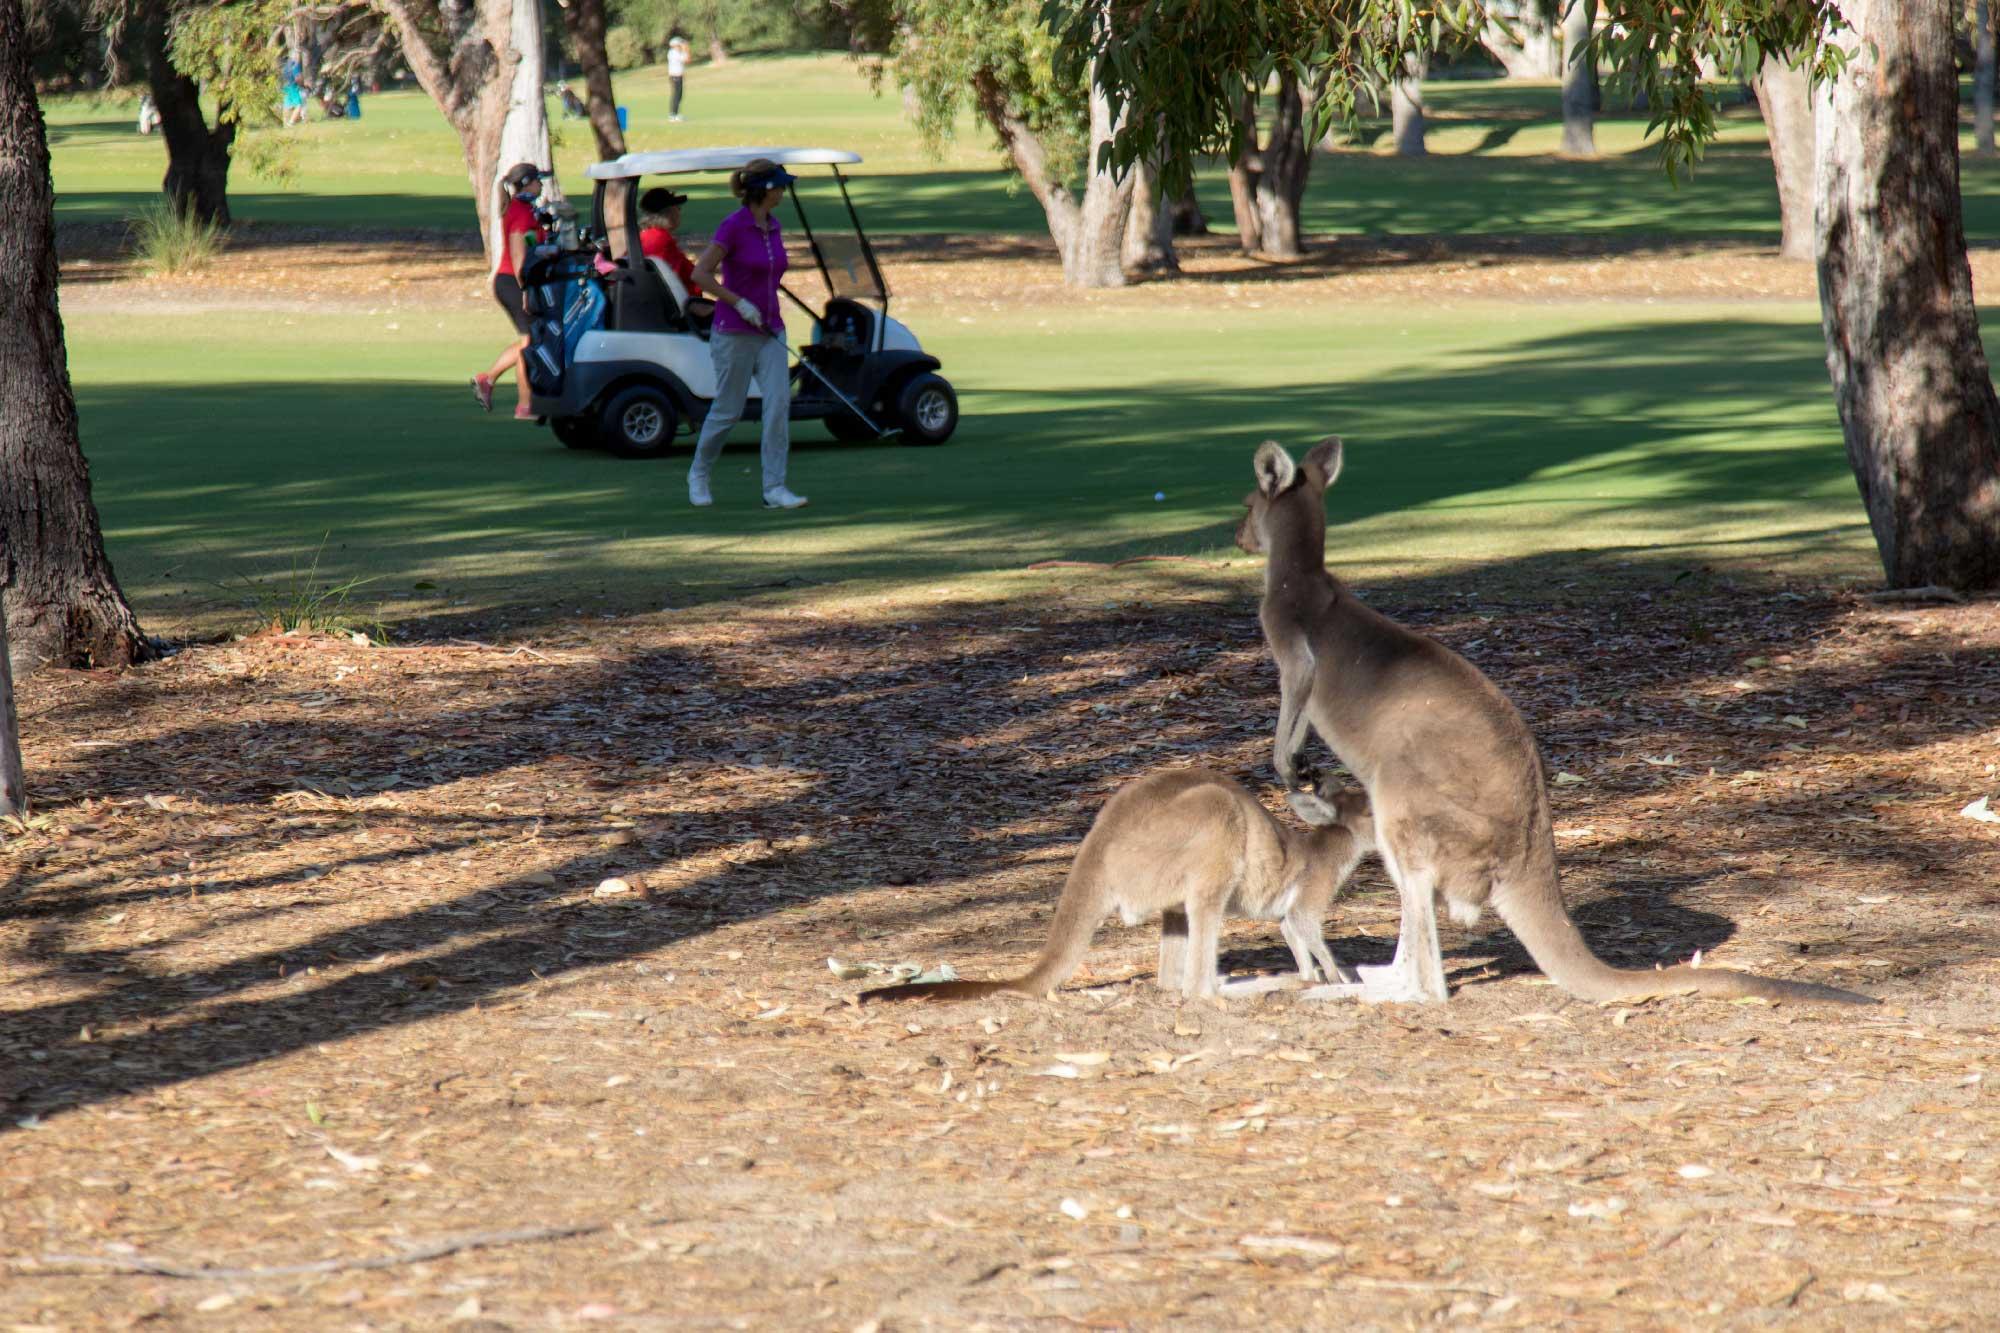 Mandurah Golf and Country Club